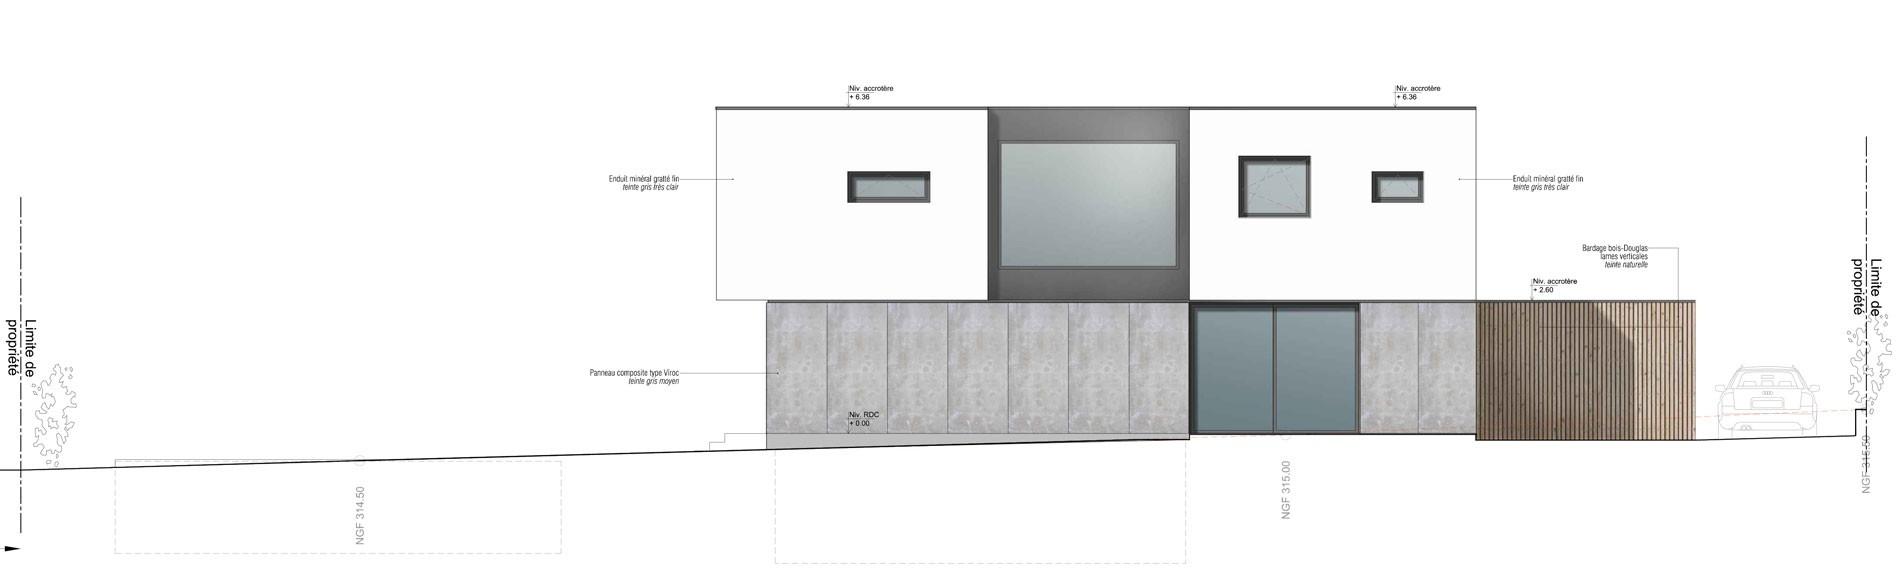 asb-architecture-maison-contemporaine-toiture-terrasse-facade-3